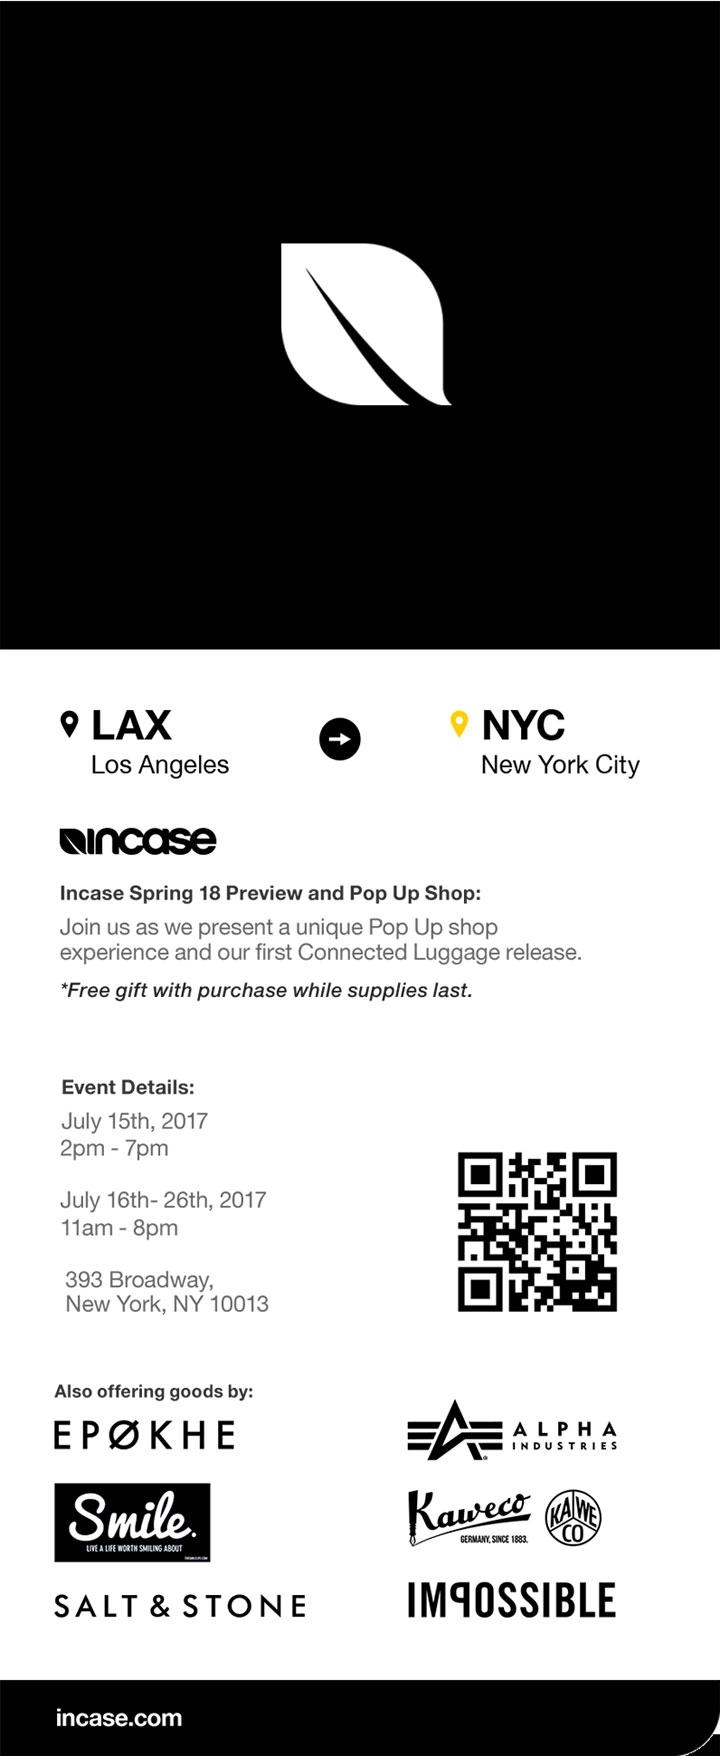 Incase NYC Pop Up Shop